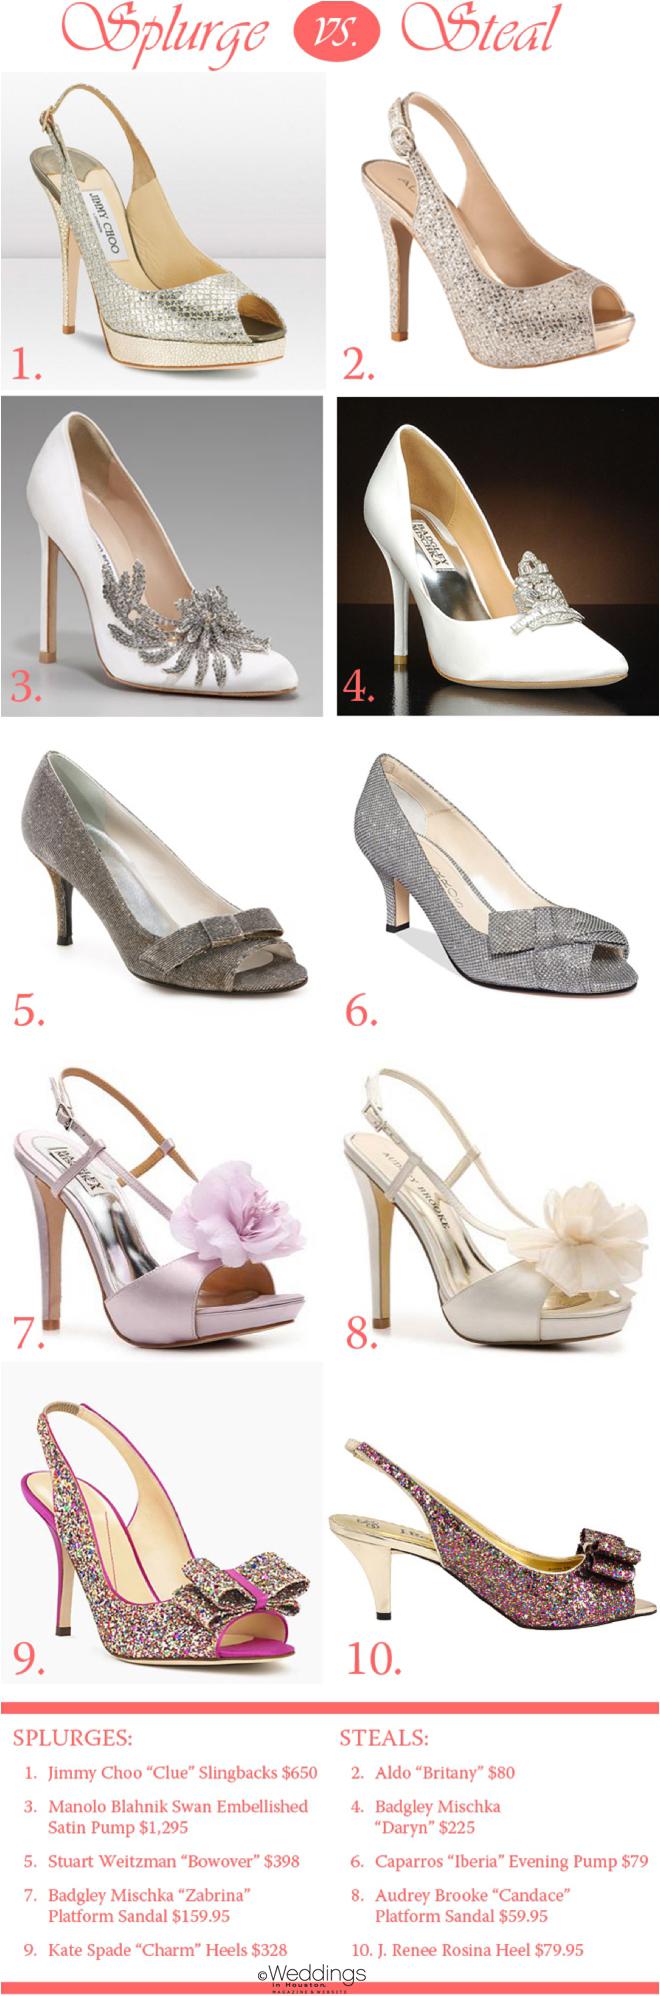 Shoe Edition: Splurge vs. Steal